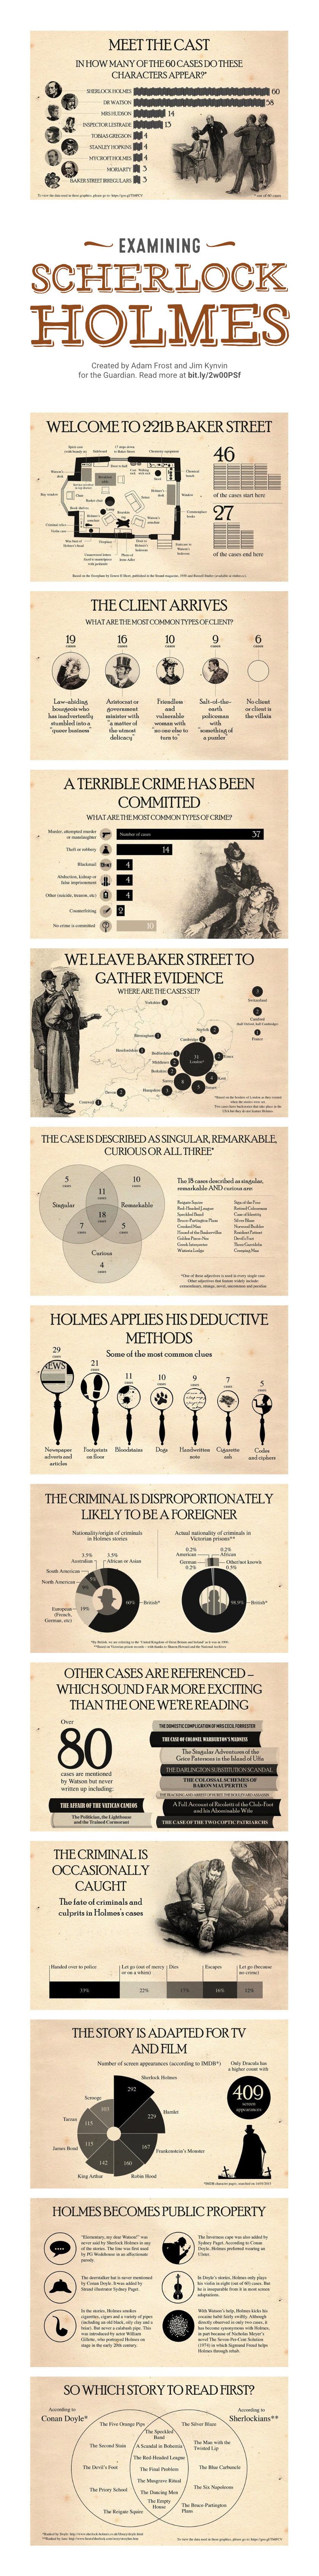 Examining Sherlock Holmes #infographic